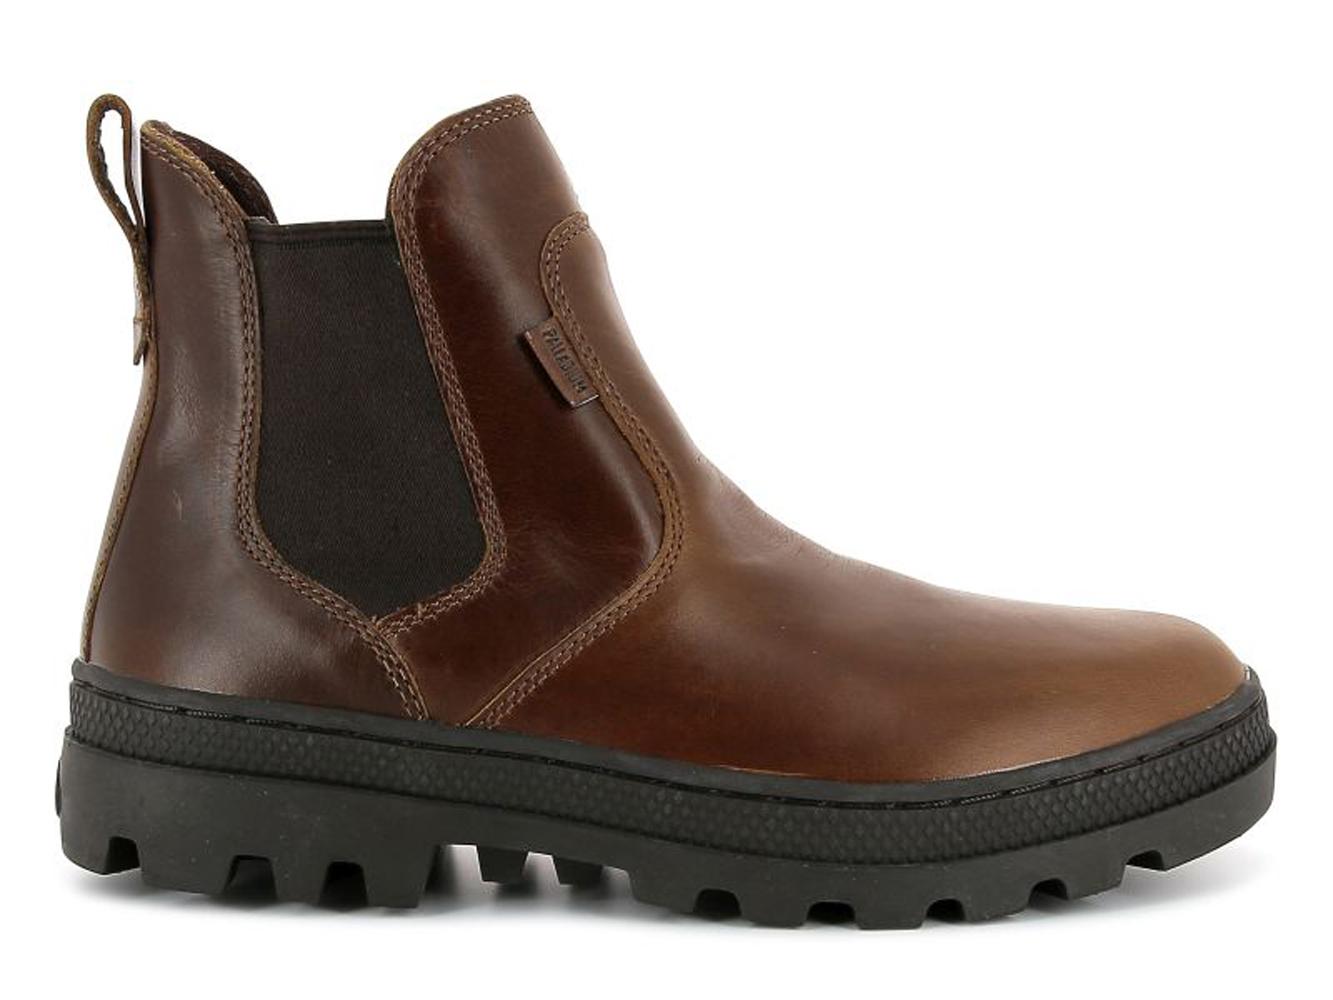 Palladium Pallabosse Hi Cuff L braun Stiefelette Stretch Boots Leder